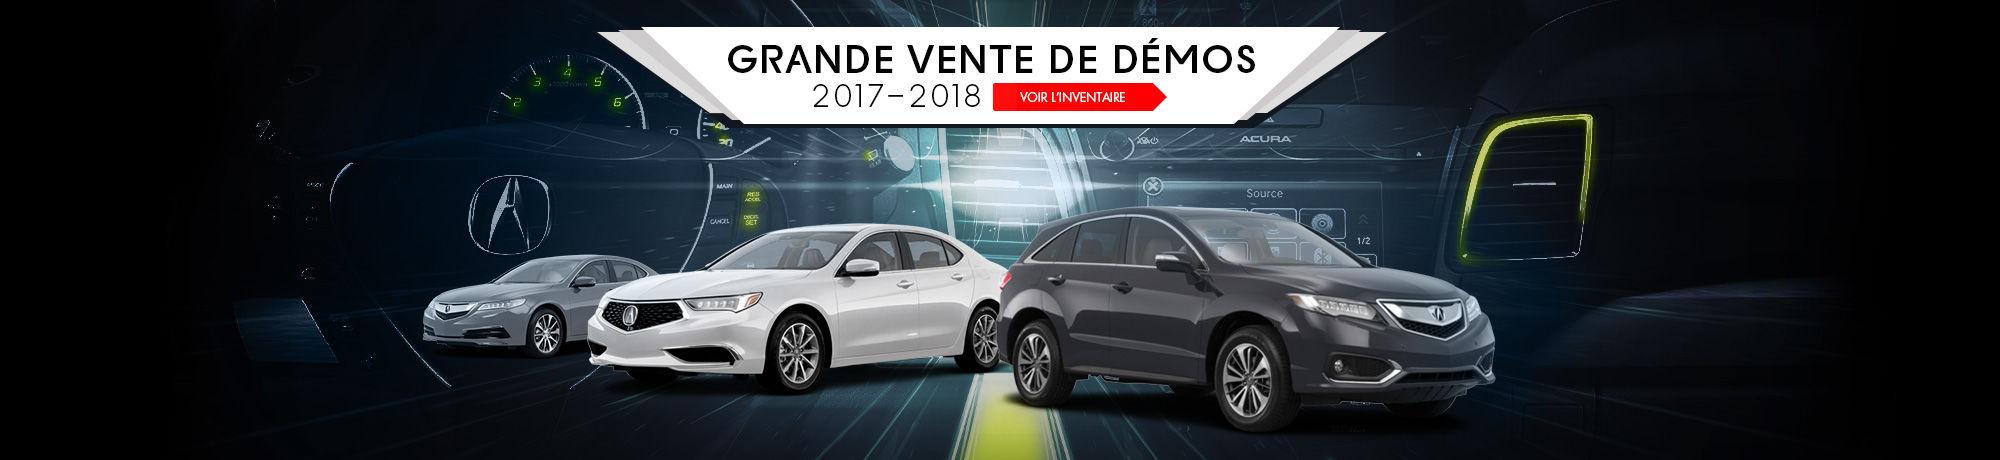 GRANDE VENTE DE DéMOS